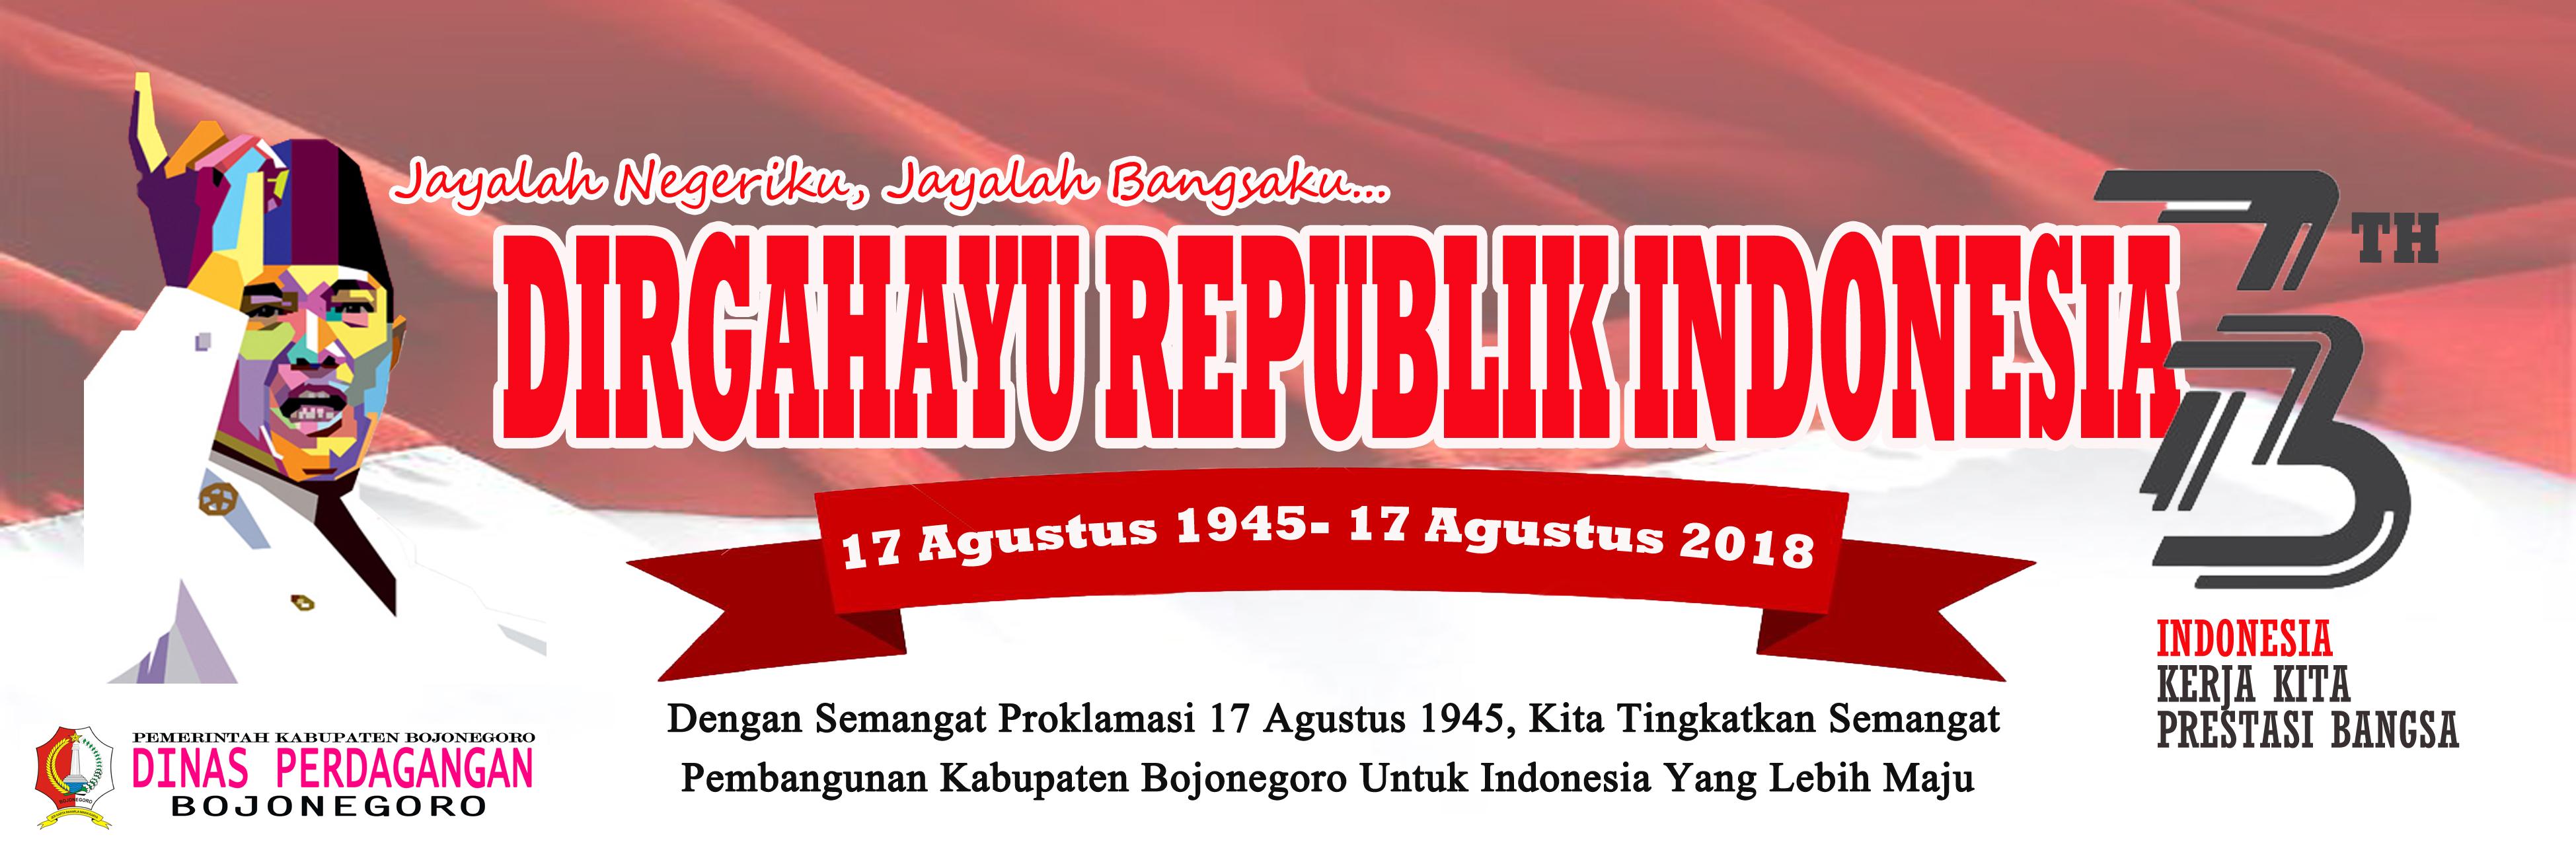 DIRGAHAYU REPUBLIK INDONESIA 73<BR>Semangat Proklamasi 17 Agustus 1945